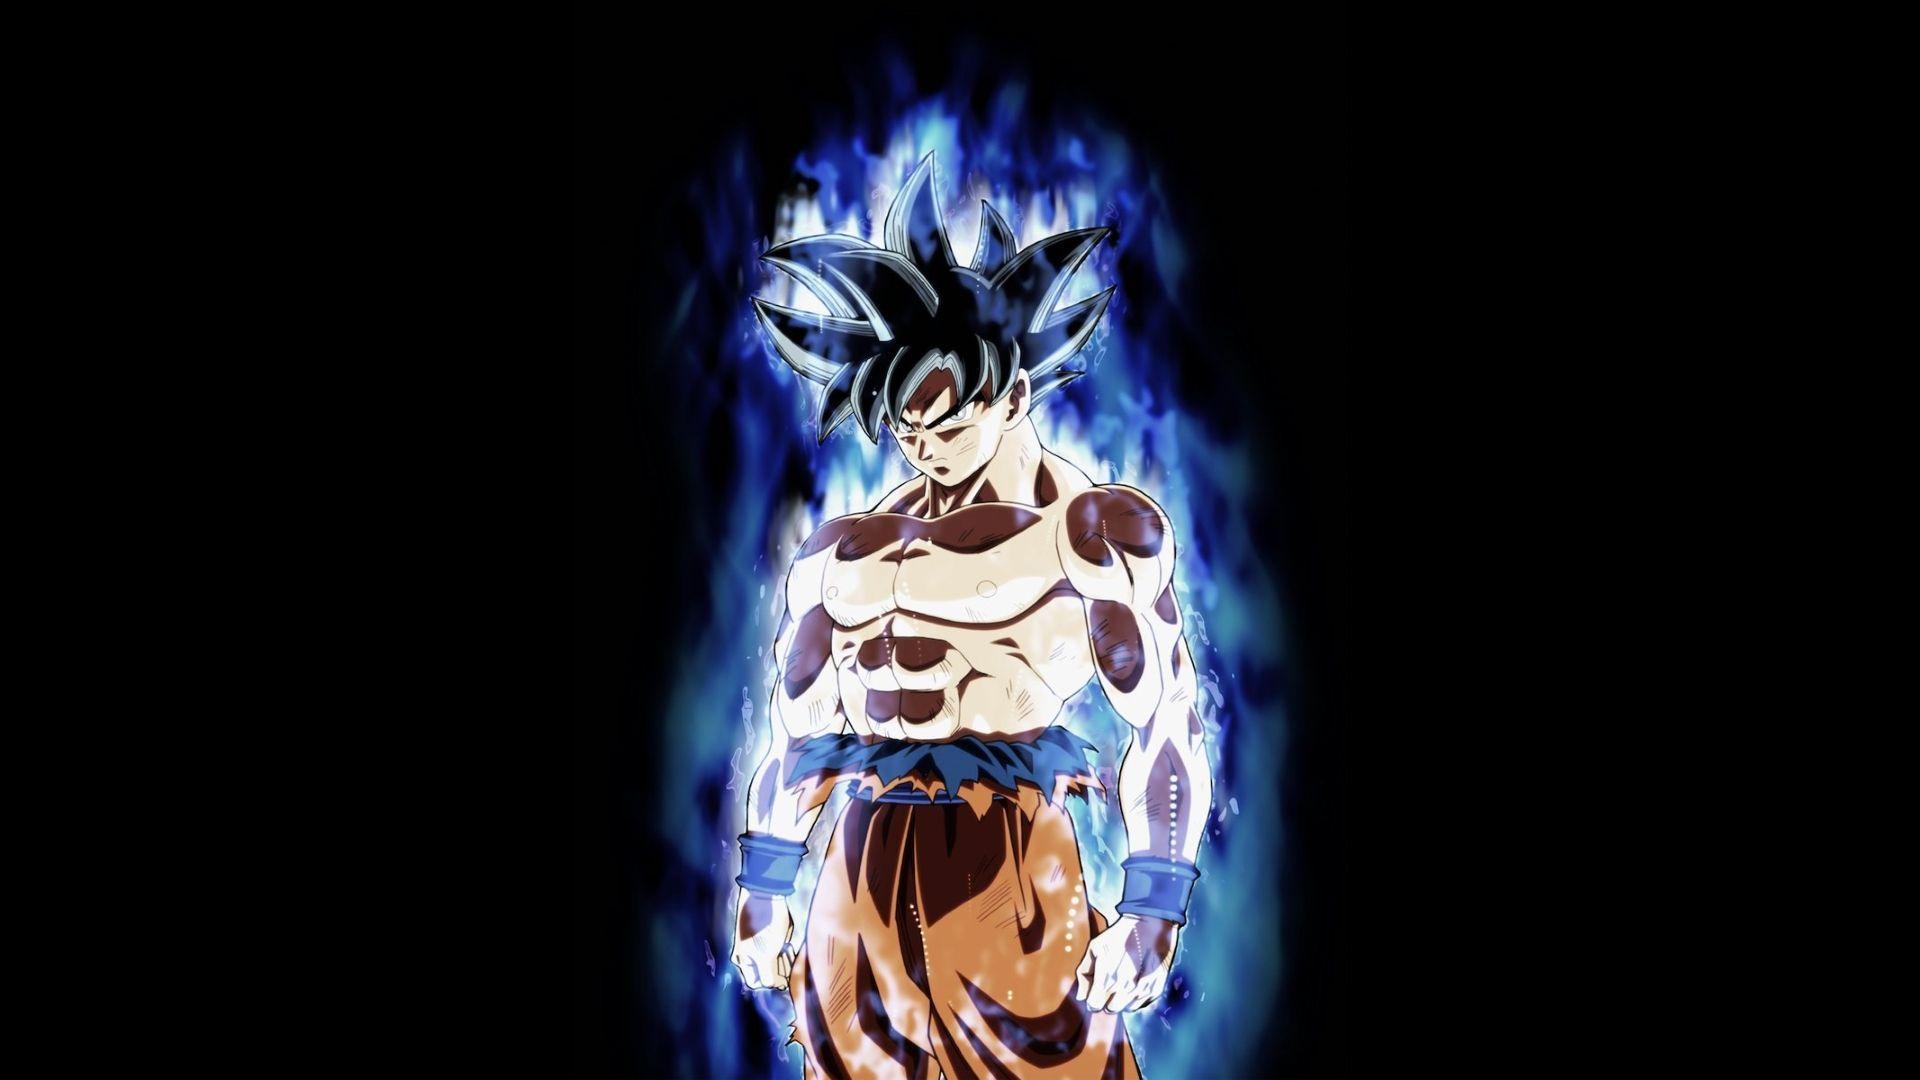 Goku Ultra Instinct Live Wallpaper Download Iphone